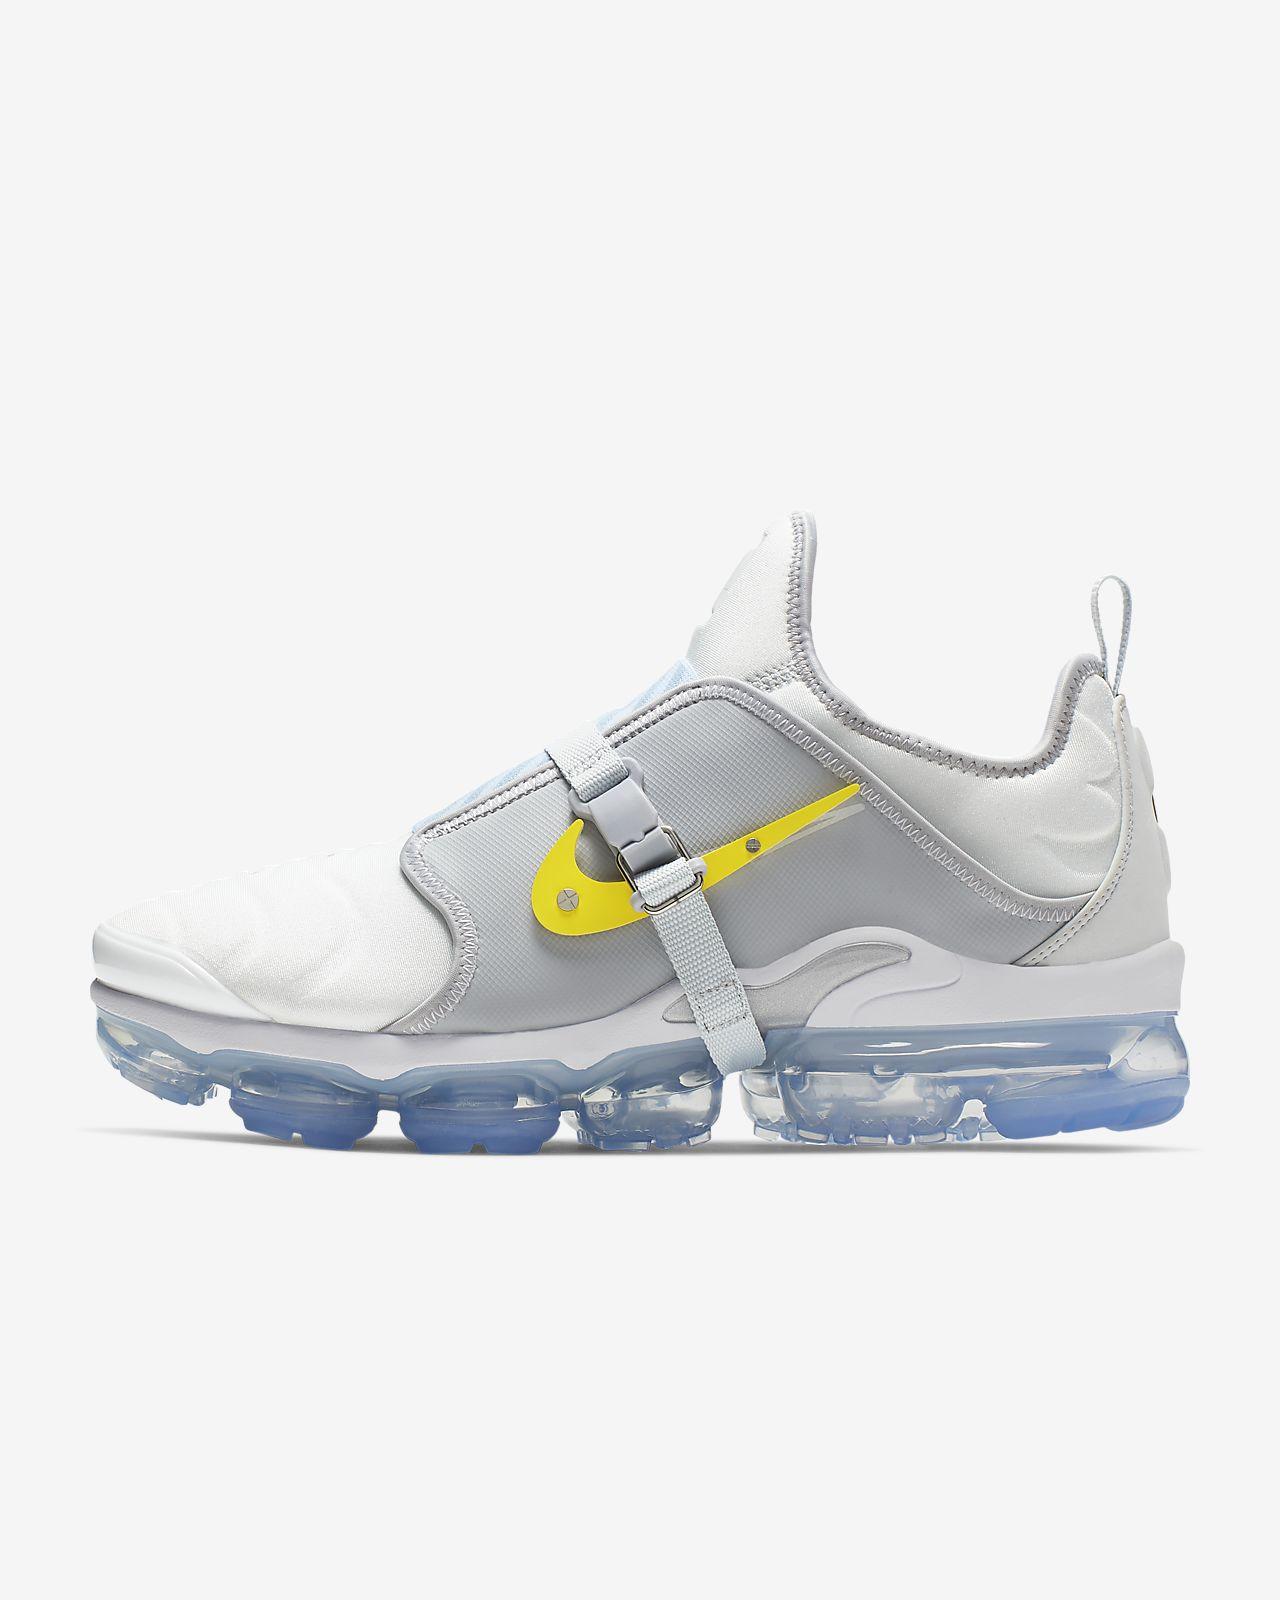 Nike Air VaporMax Plus On Air Lou Matheron Shoe